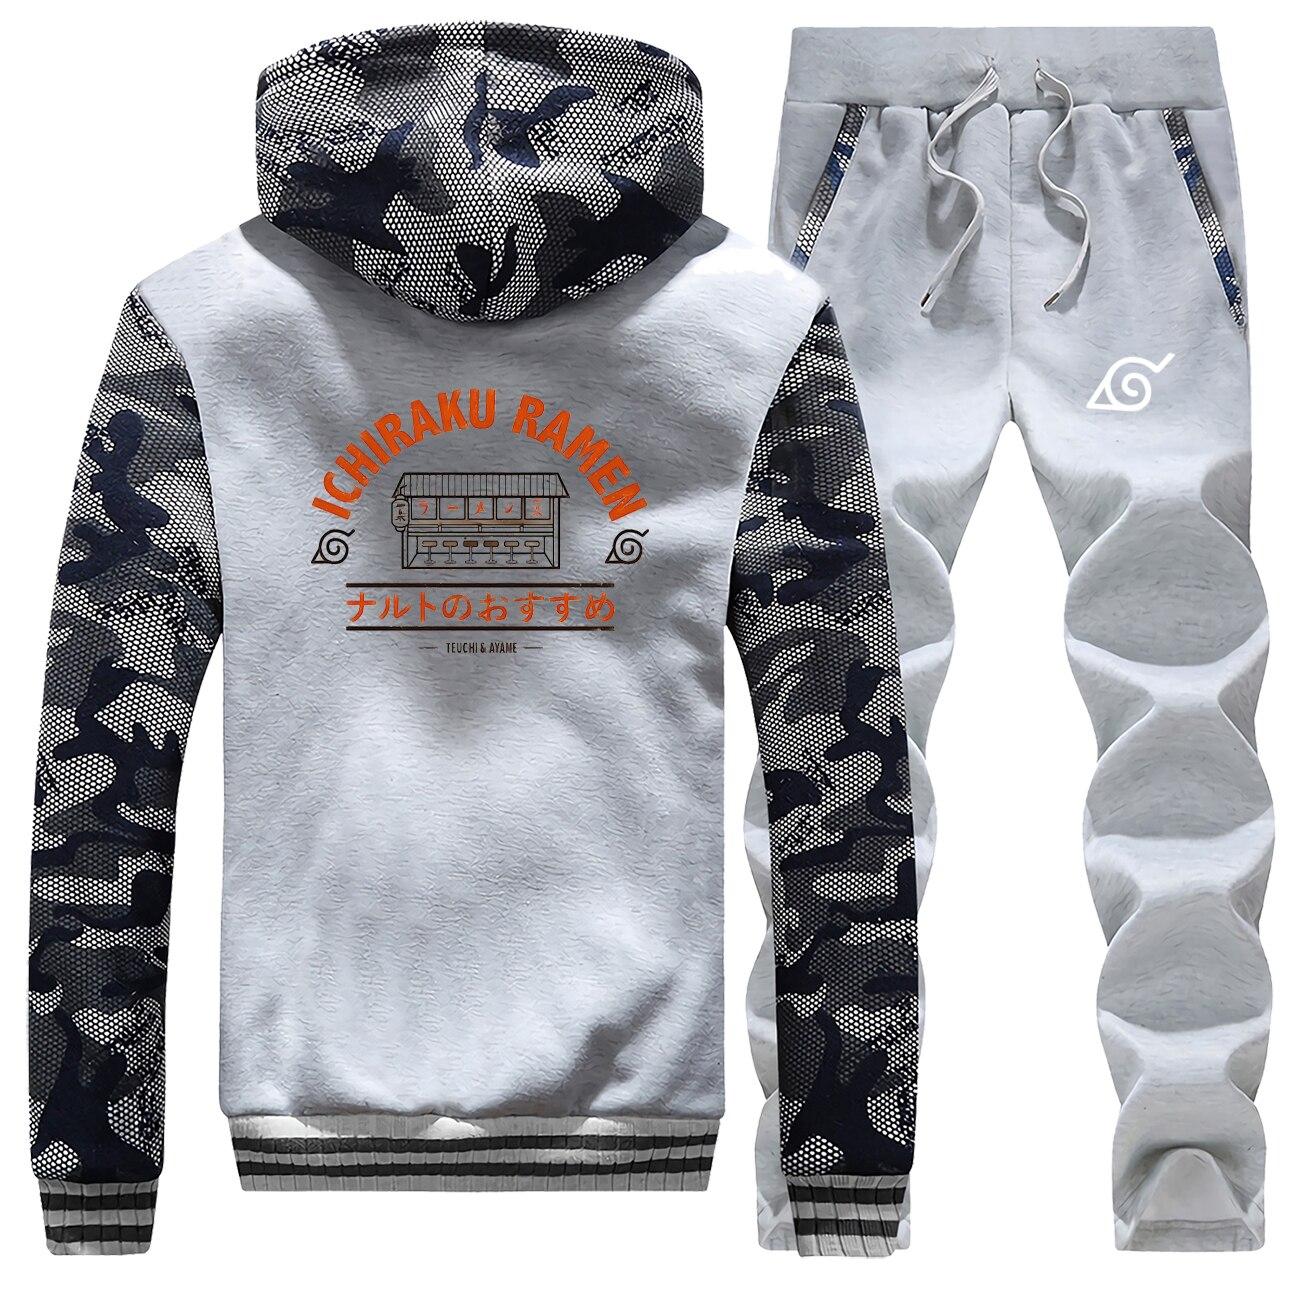 Naruto Thick Men's Camo Sets Ichiraku Ramen Print Hooded Jackets Set Fashion Japan Anime Pants Sweatshirts Harajuku Streetwear